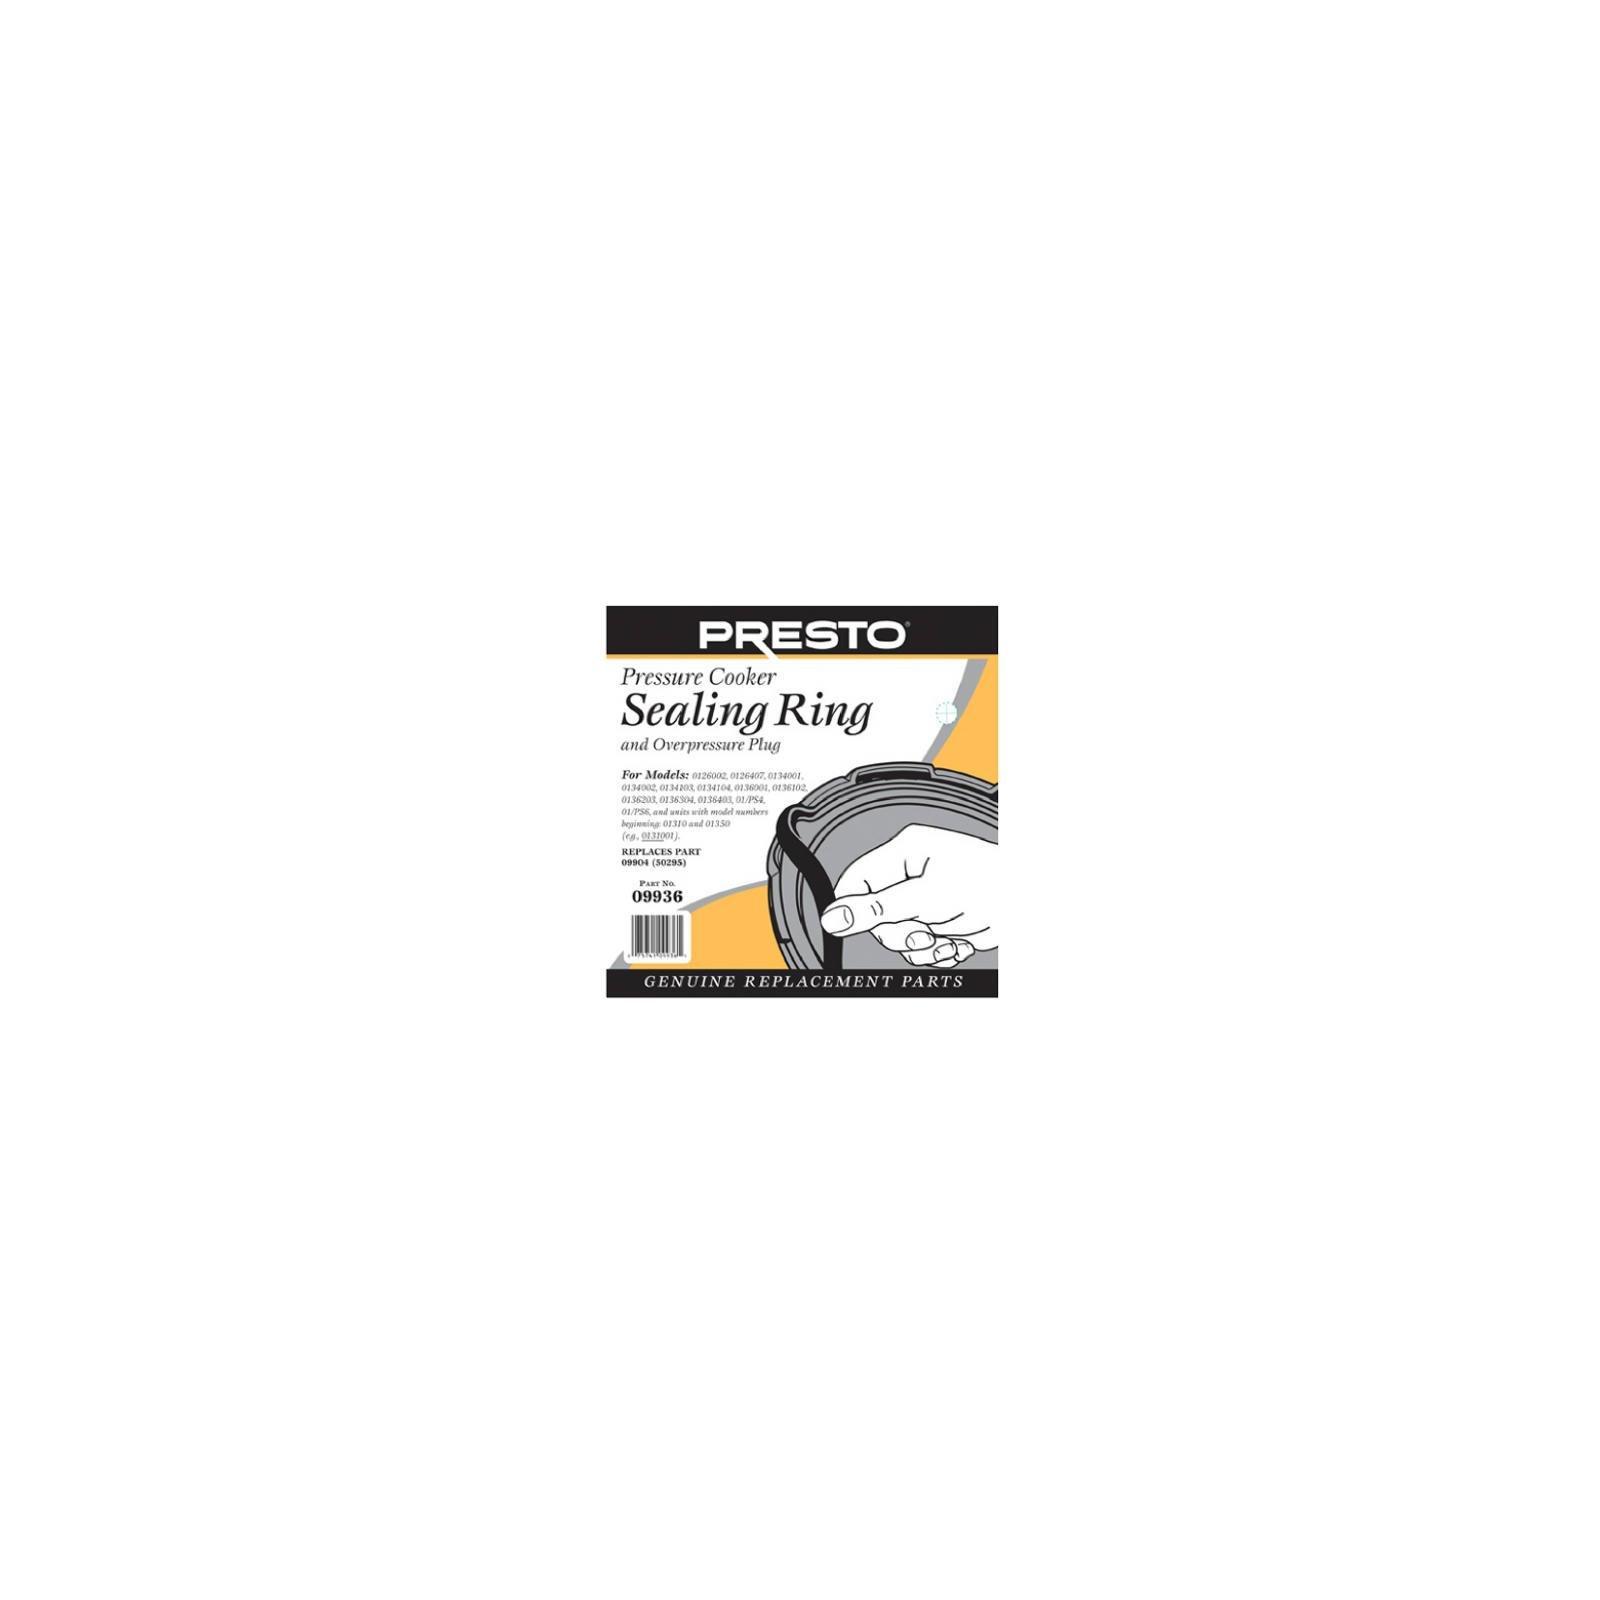 Presto 09936 Pressure Cooker Sealing Ring